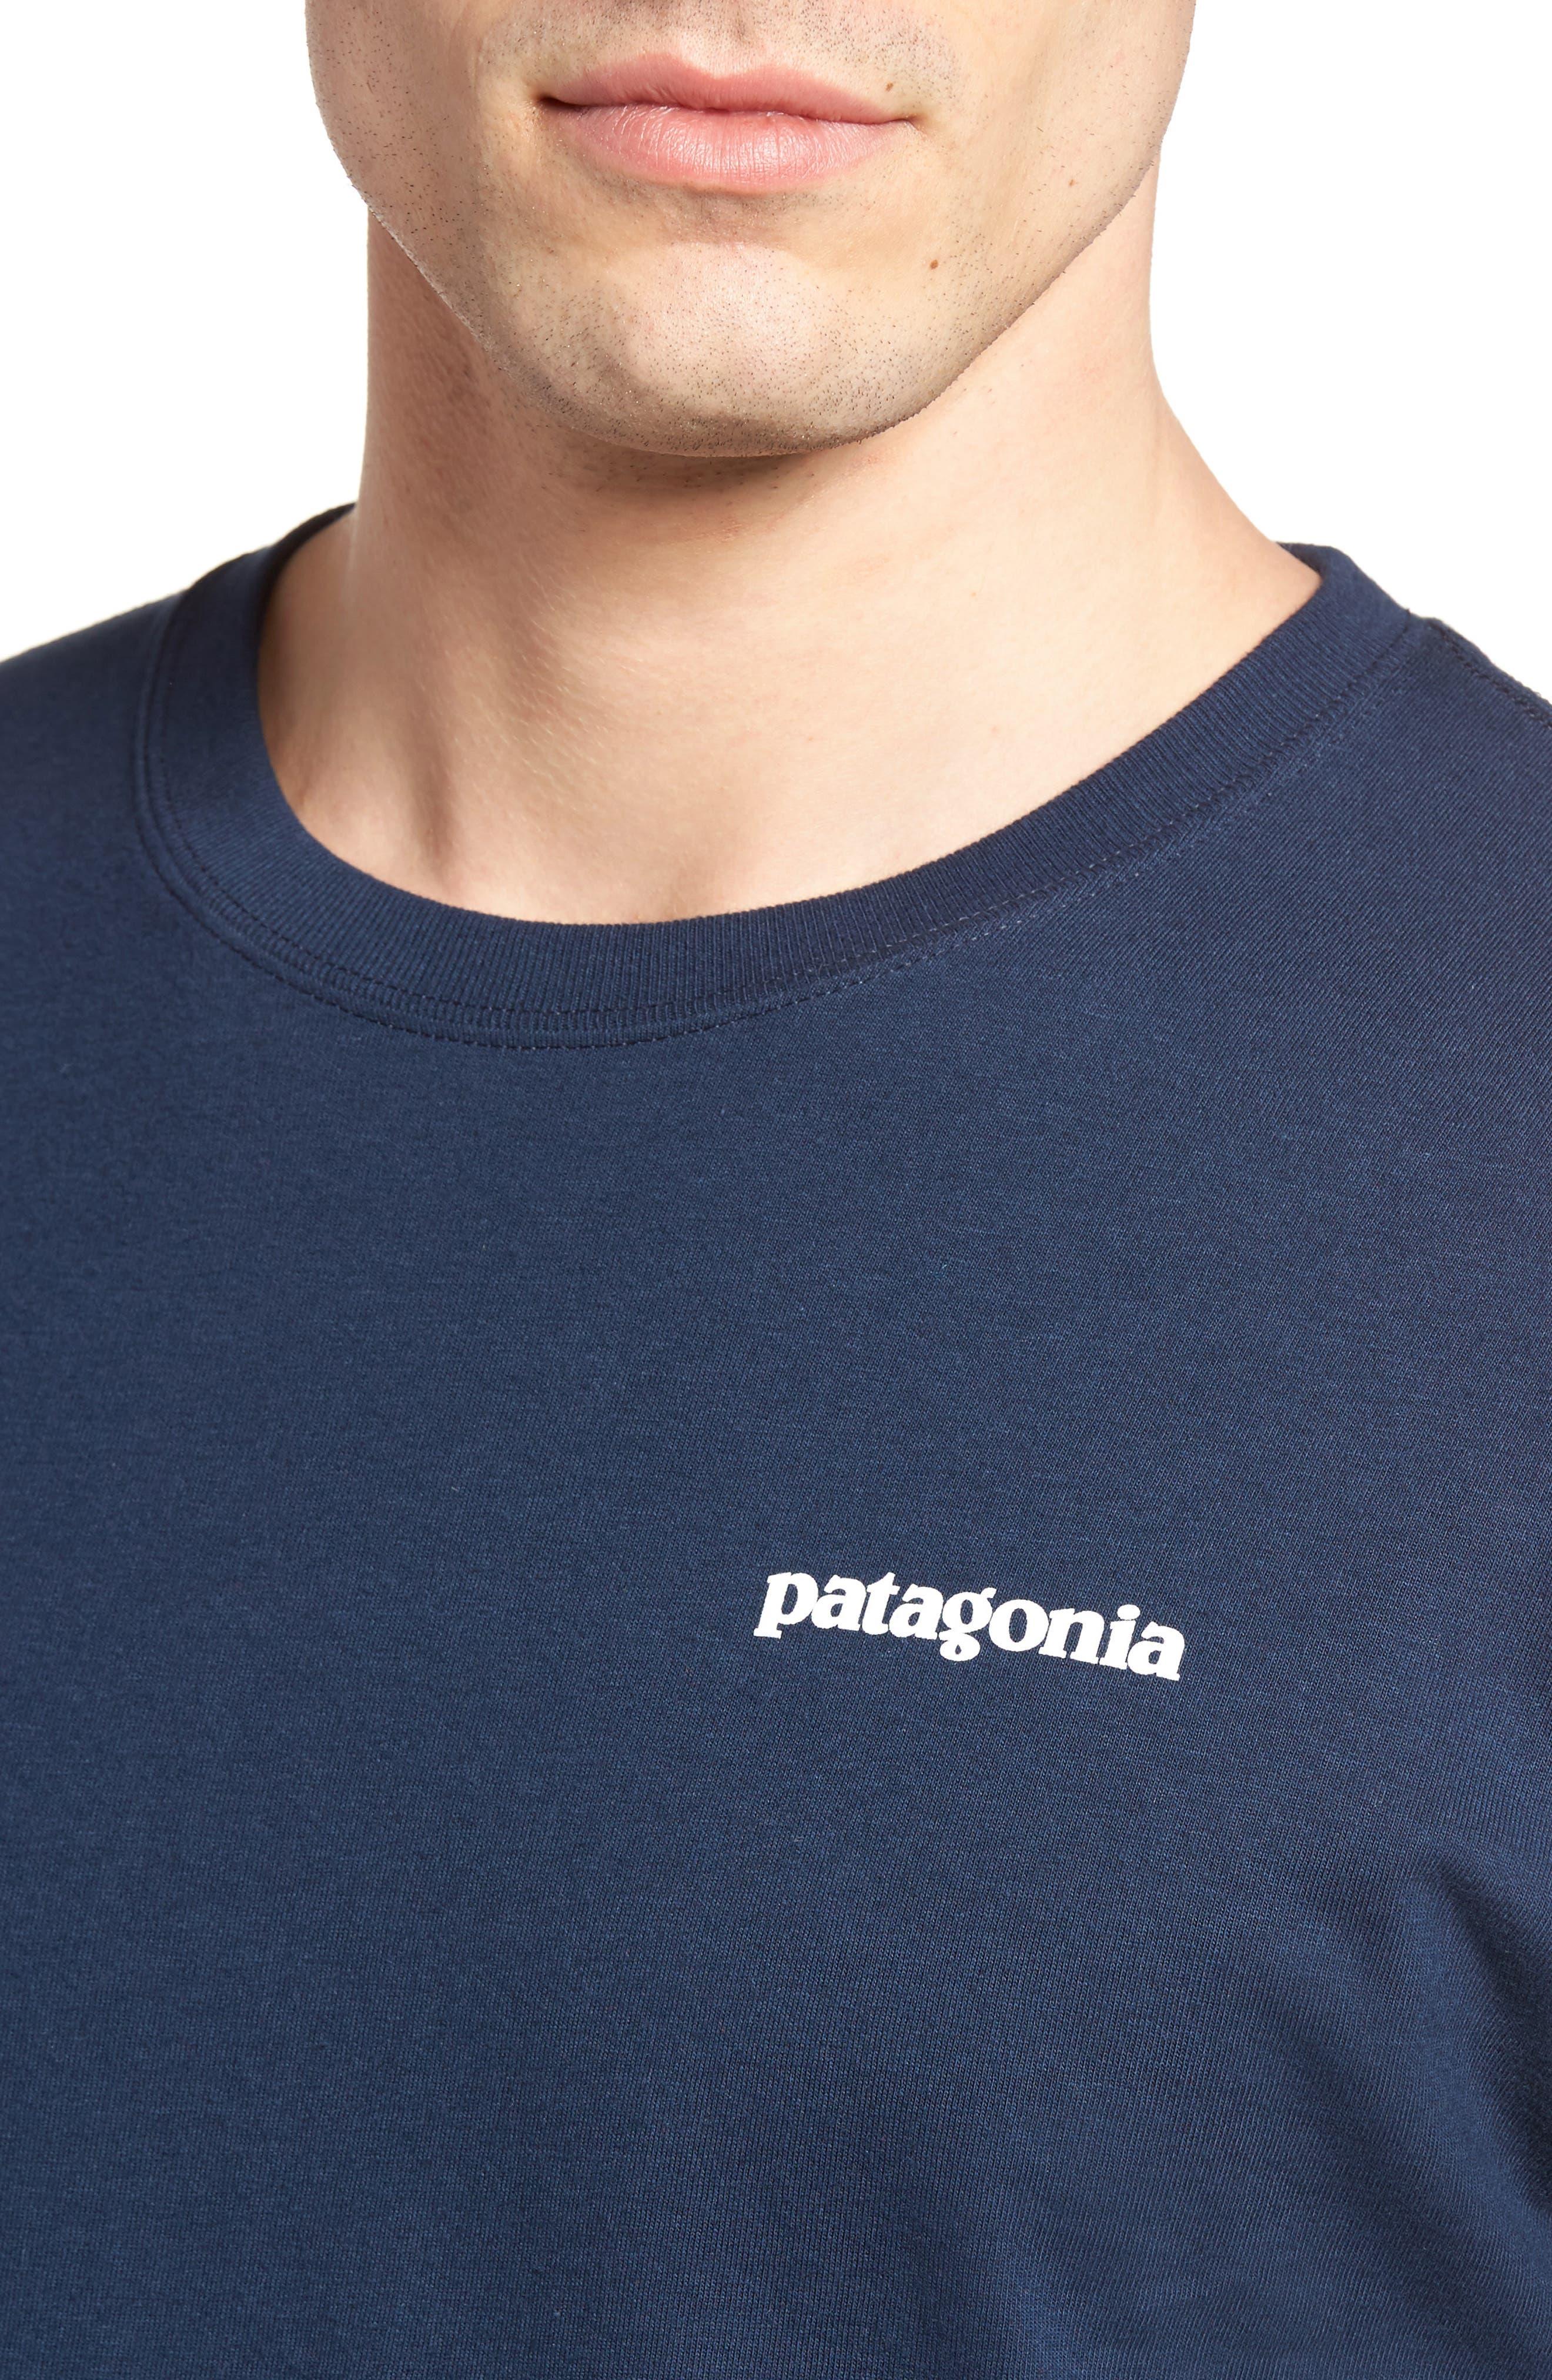 P-6 Logo Organic Cotton T-Shirt,                             Alternate thumbnail 4, color,                             Blue